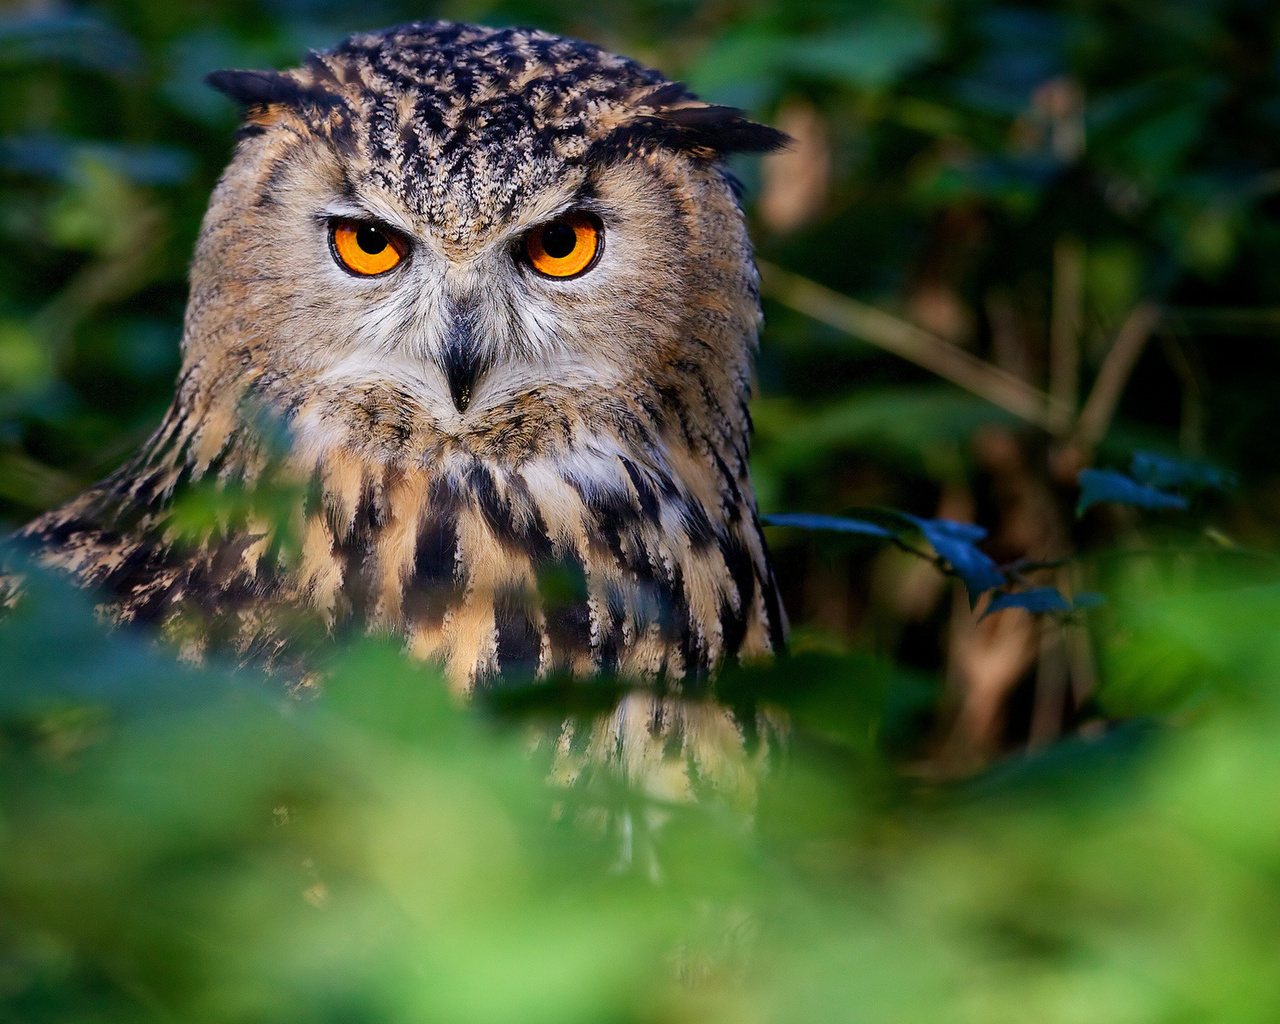 картинка сердитая сова каталоге найдете широкий